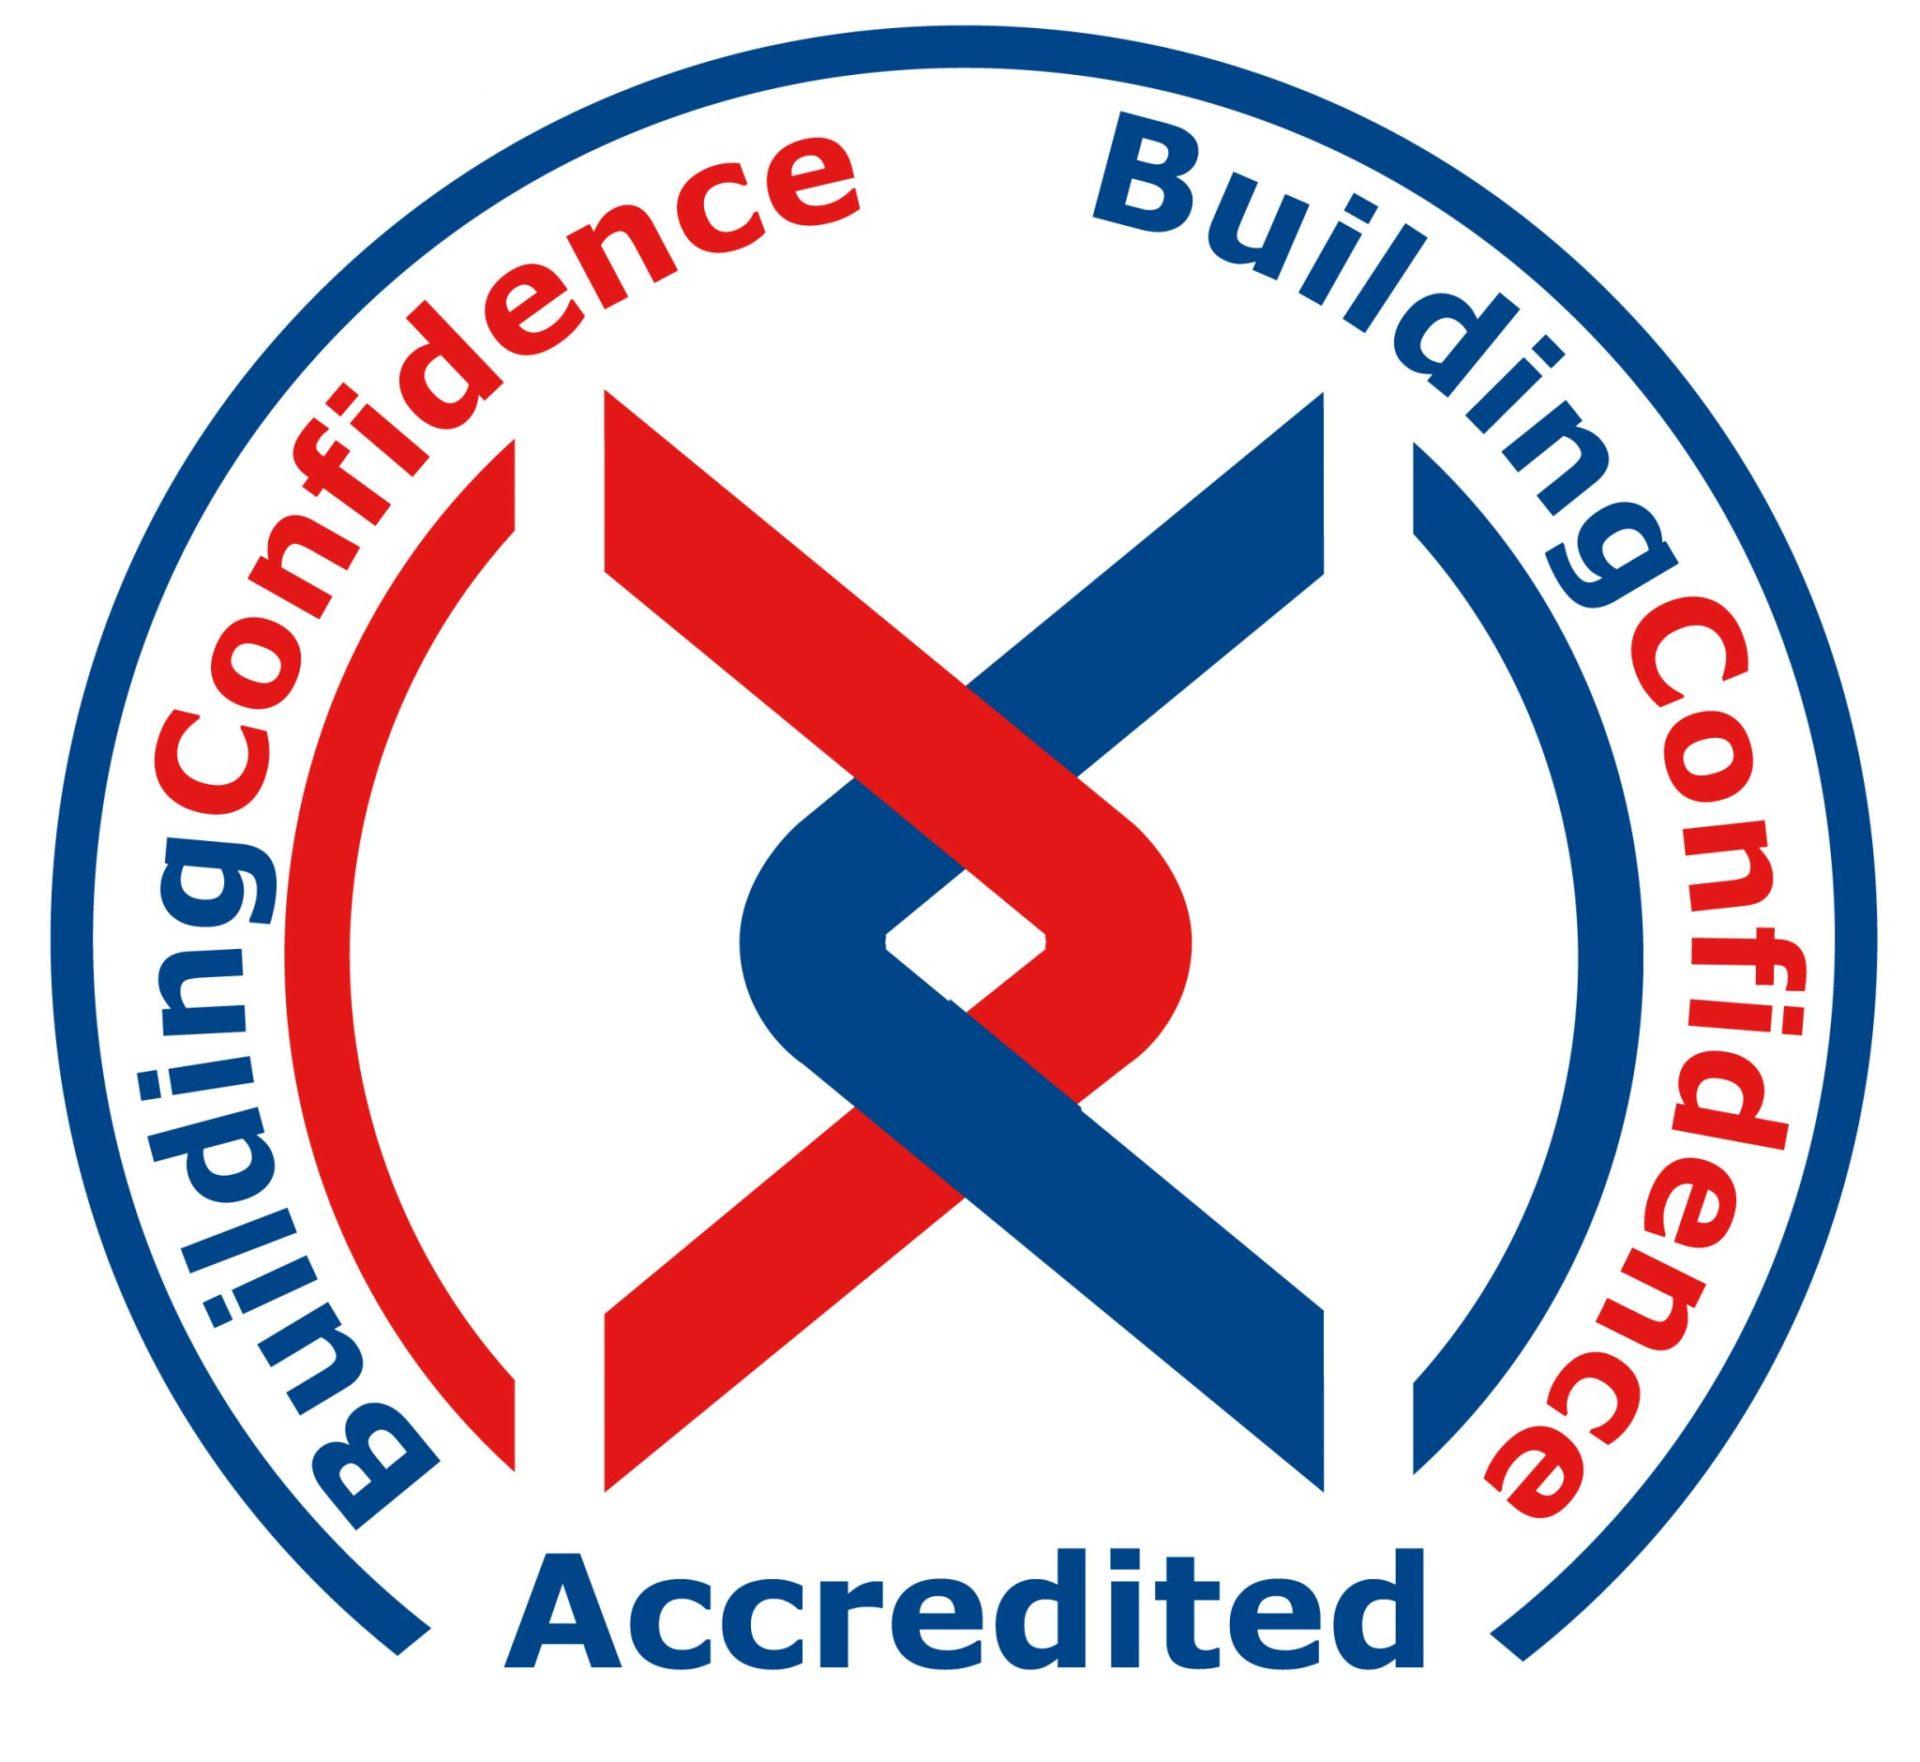 BuildingConfidenceLogo1.jpg